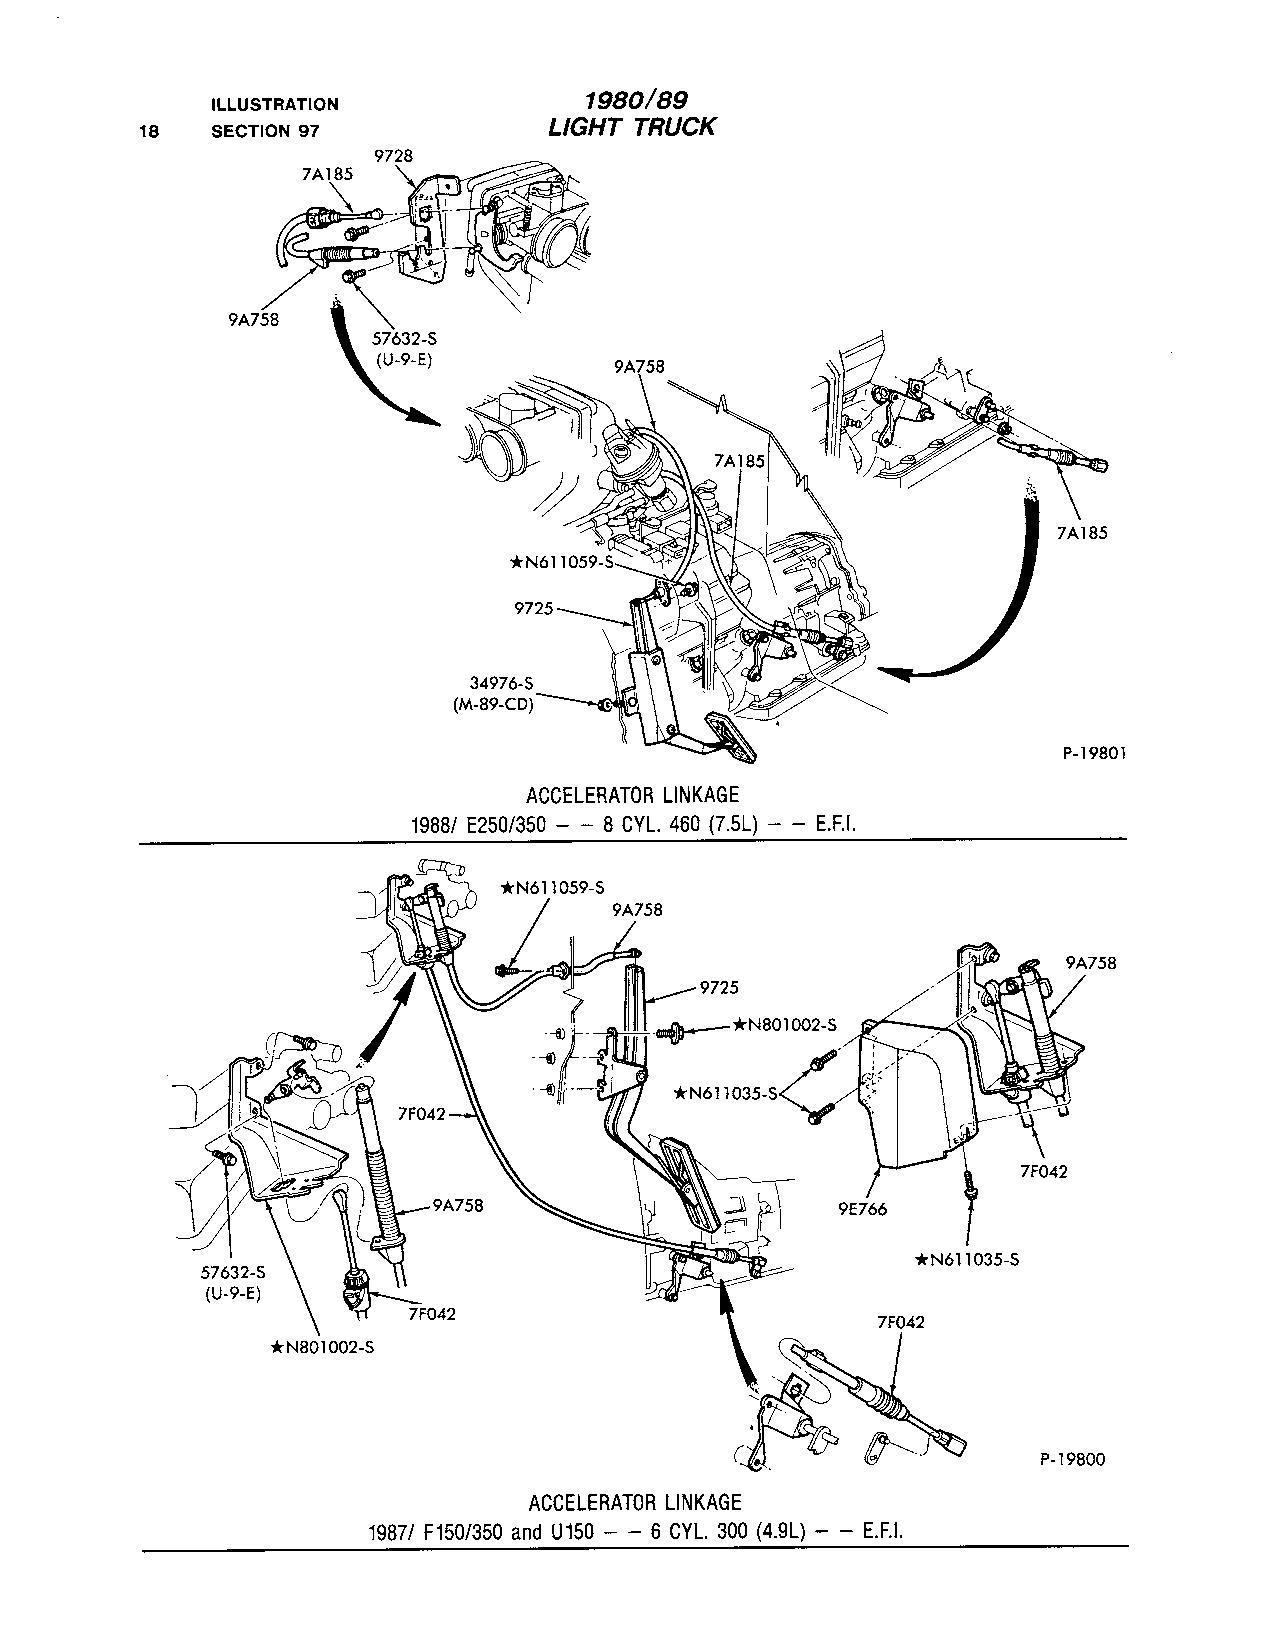 Ford F150 89' 4.9L manual Trans. Throttle return spring